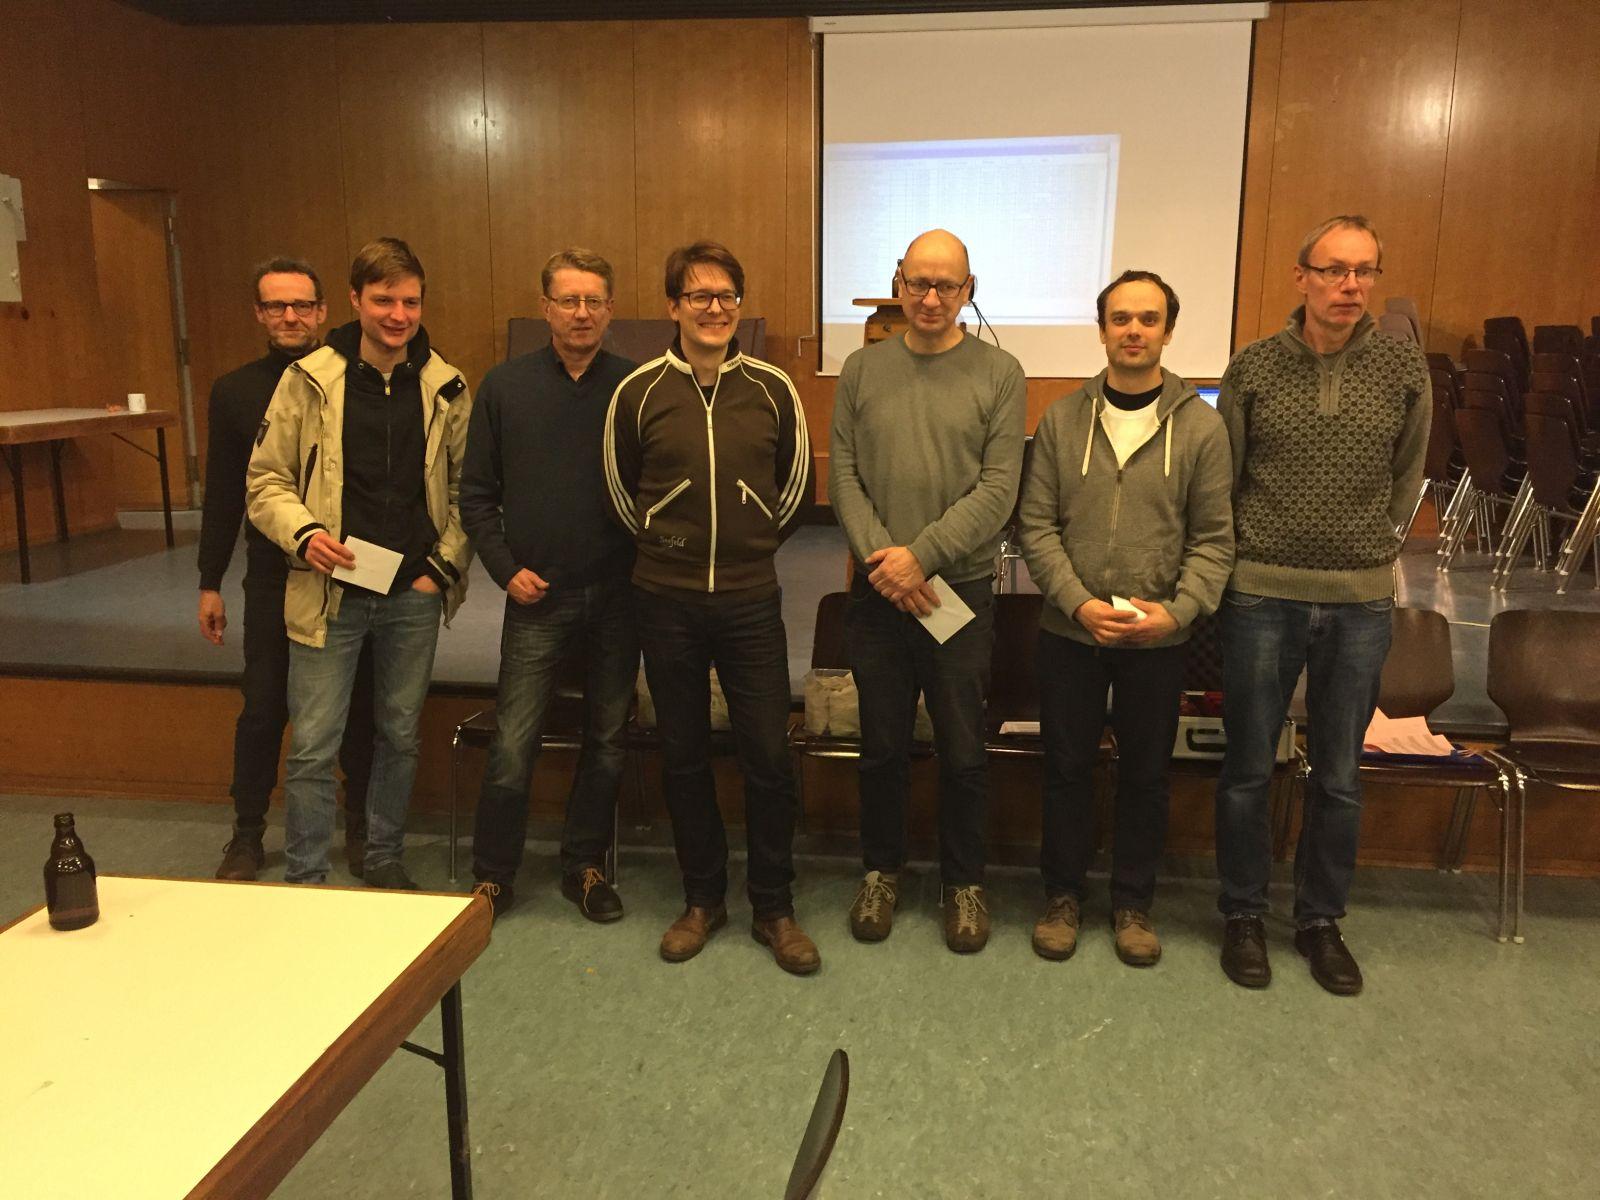 Preisträger, v.l.: Markus Winter, Maximilian Reuter, Stefan Wolff, Gerrit Voigt, Lutz Franke, Bernhard Jürgens, Jörg Holzhausen